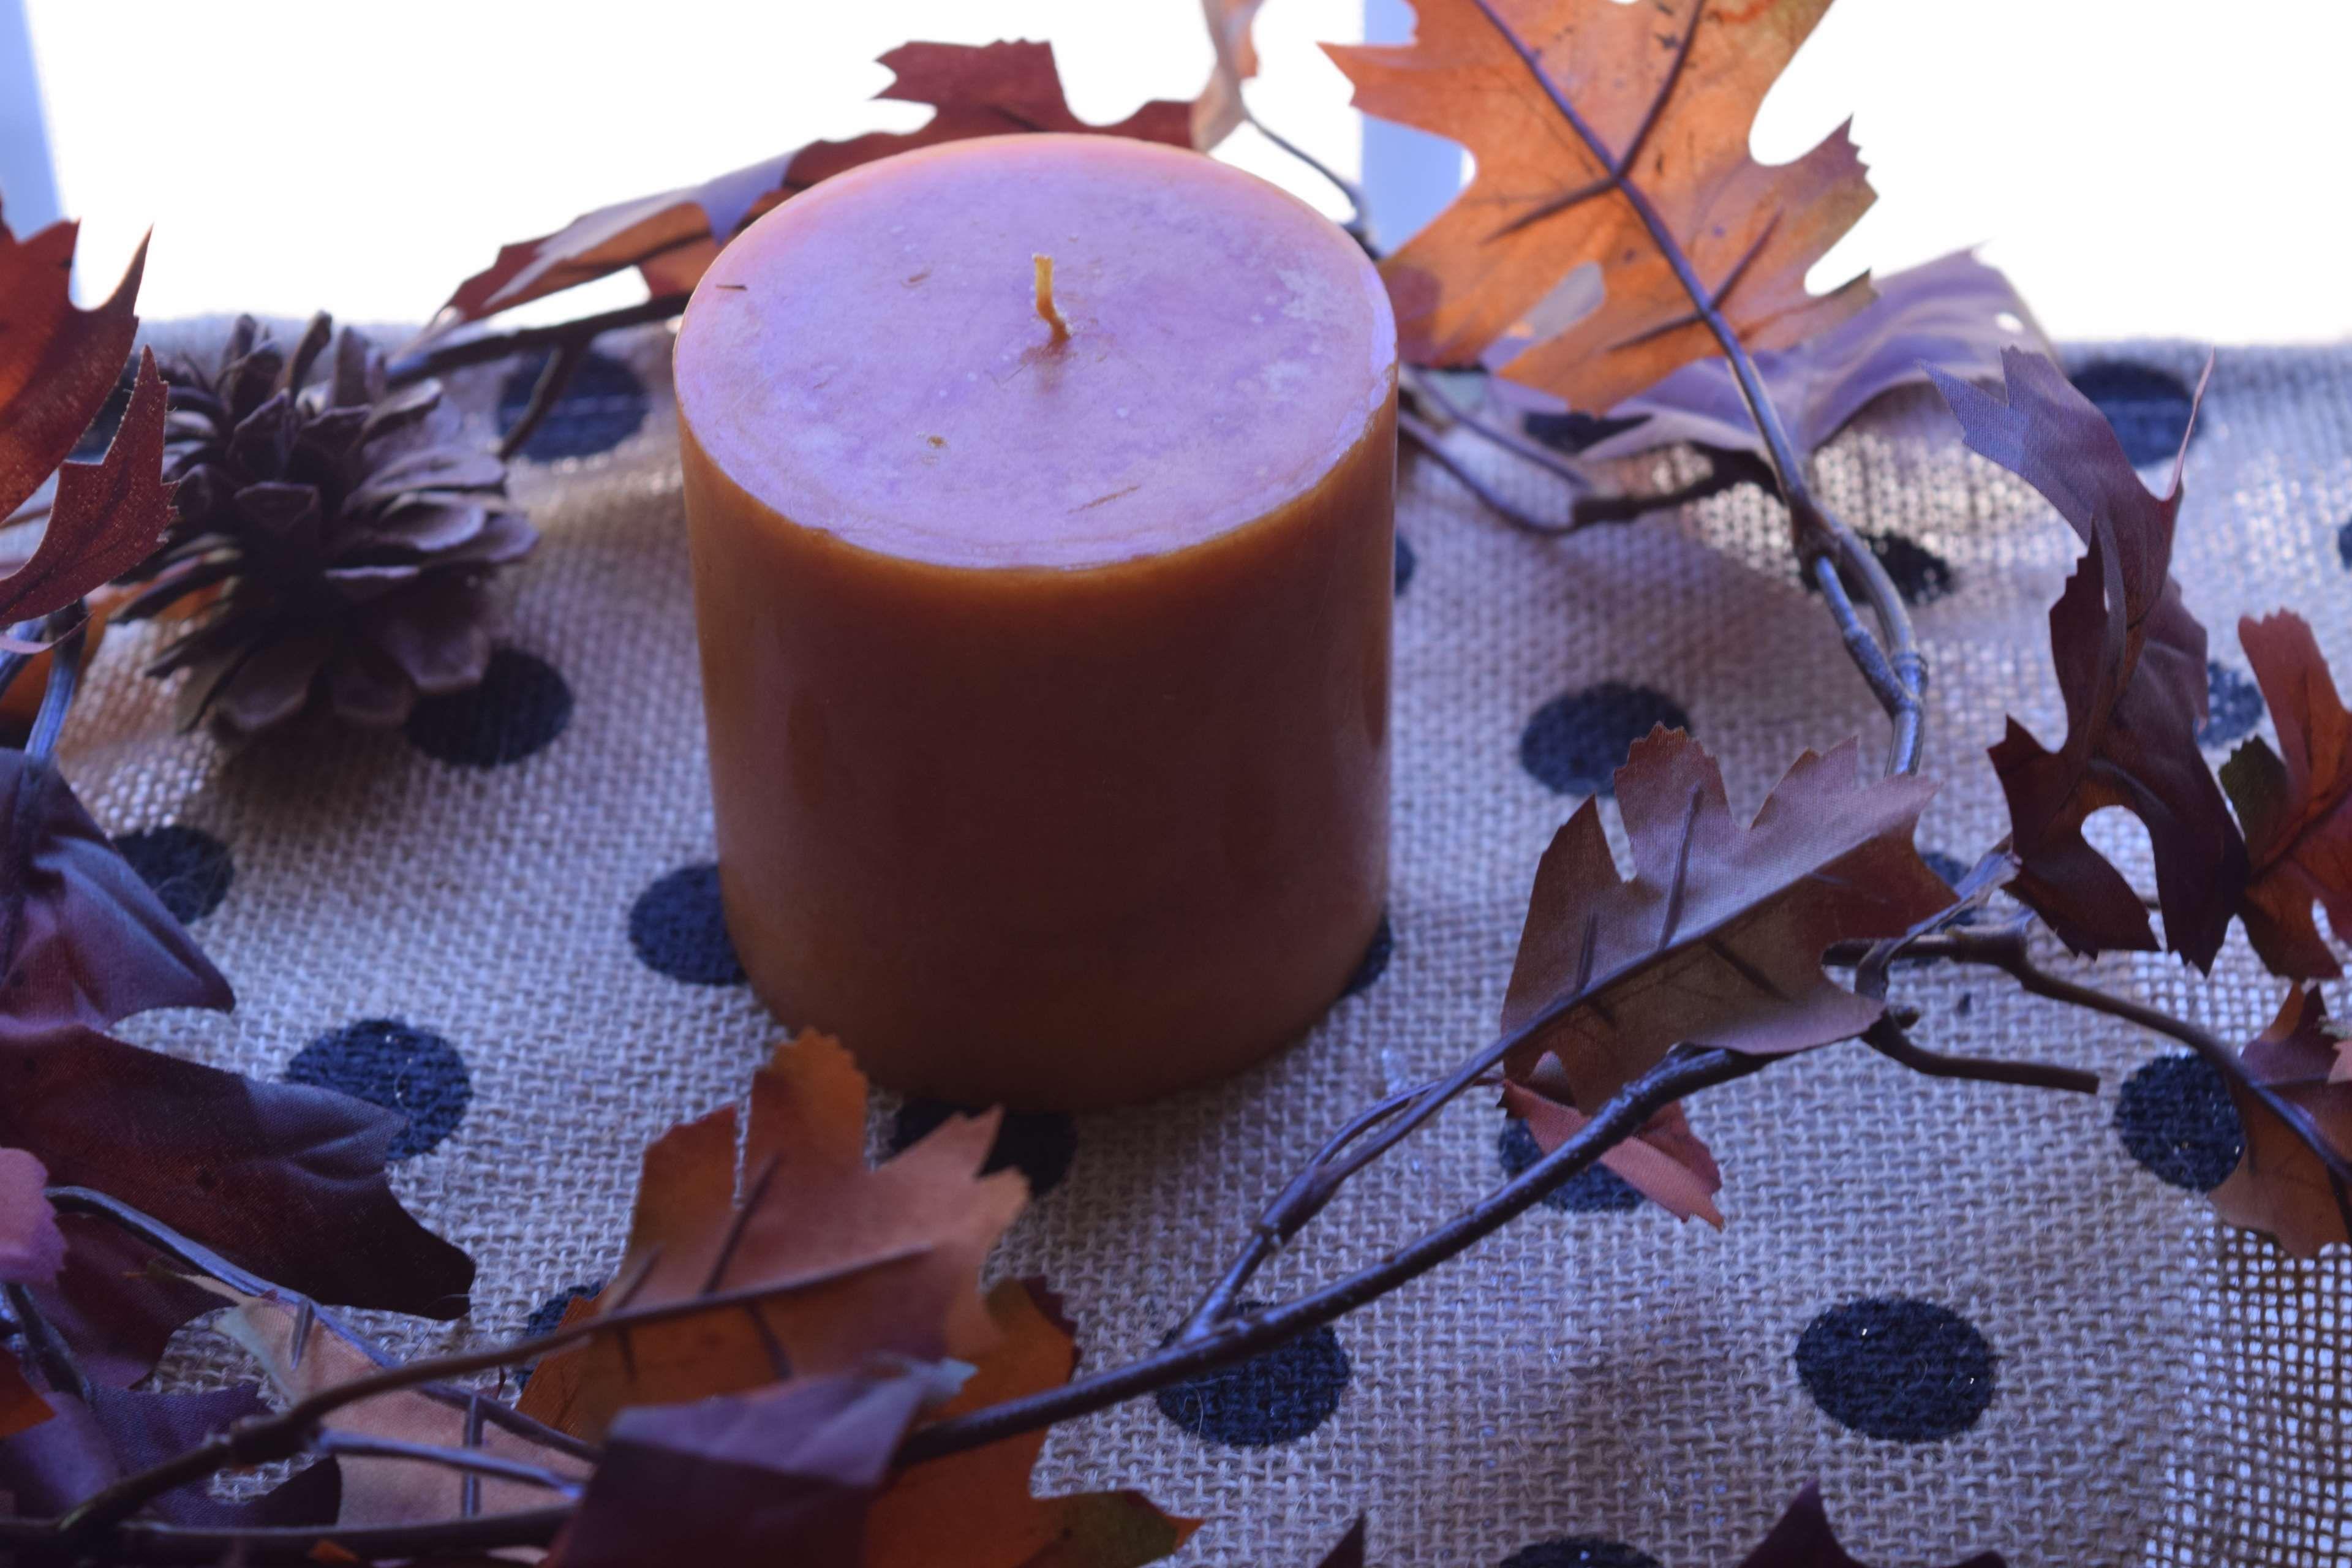 #autumn leaf #candle #fall #leaves #polka dot